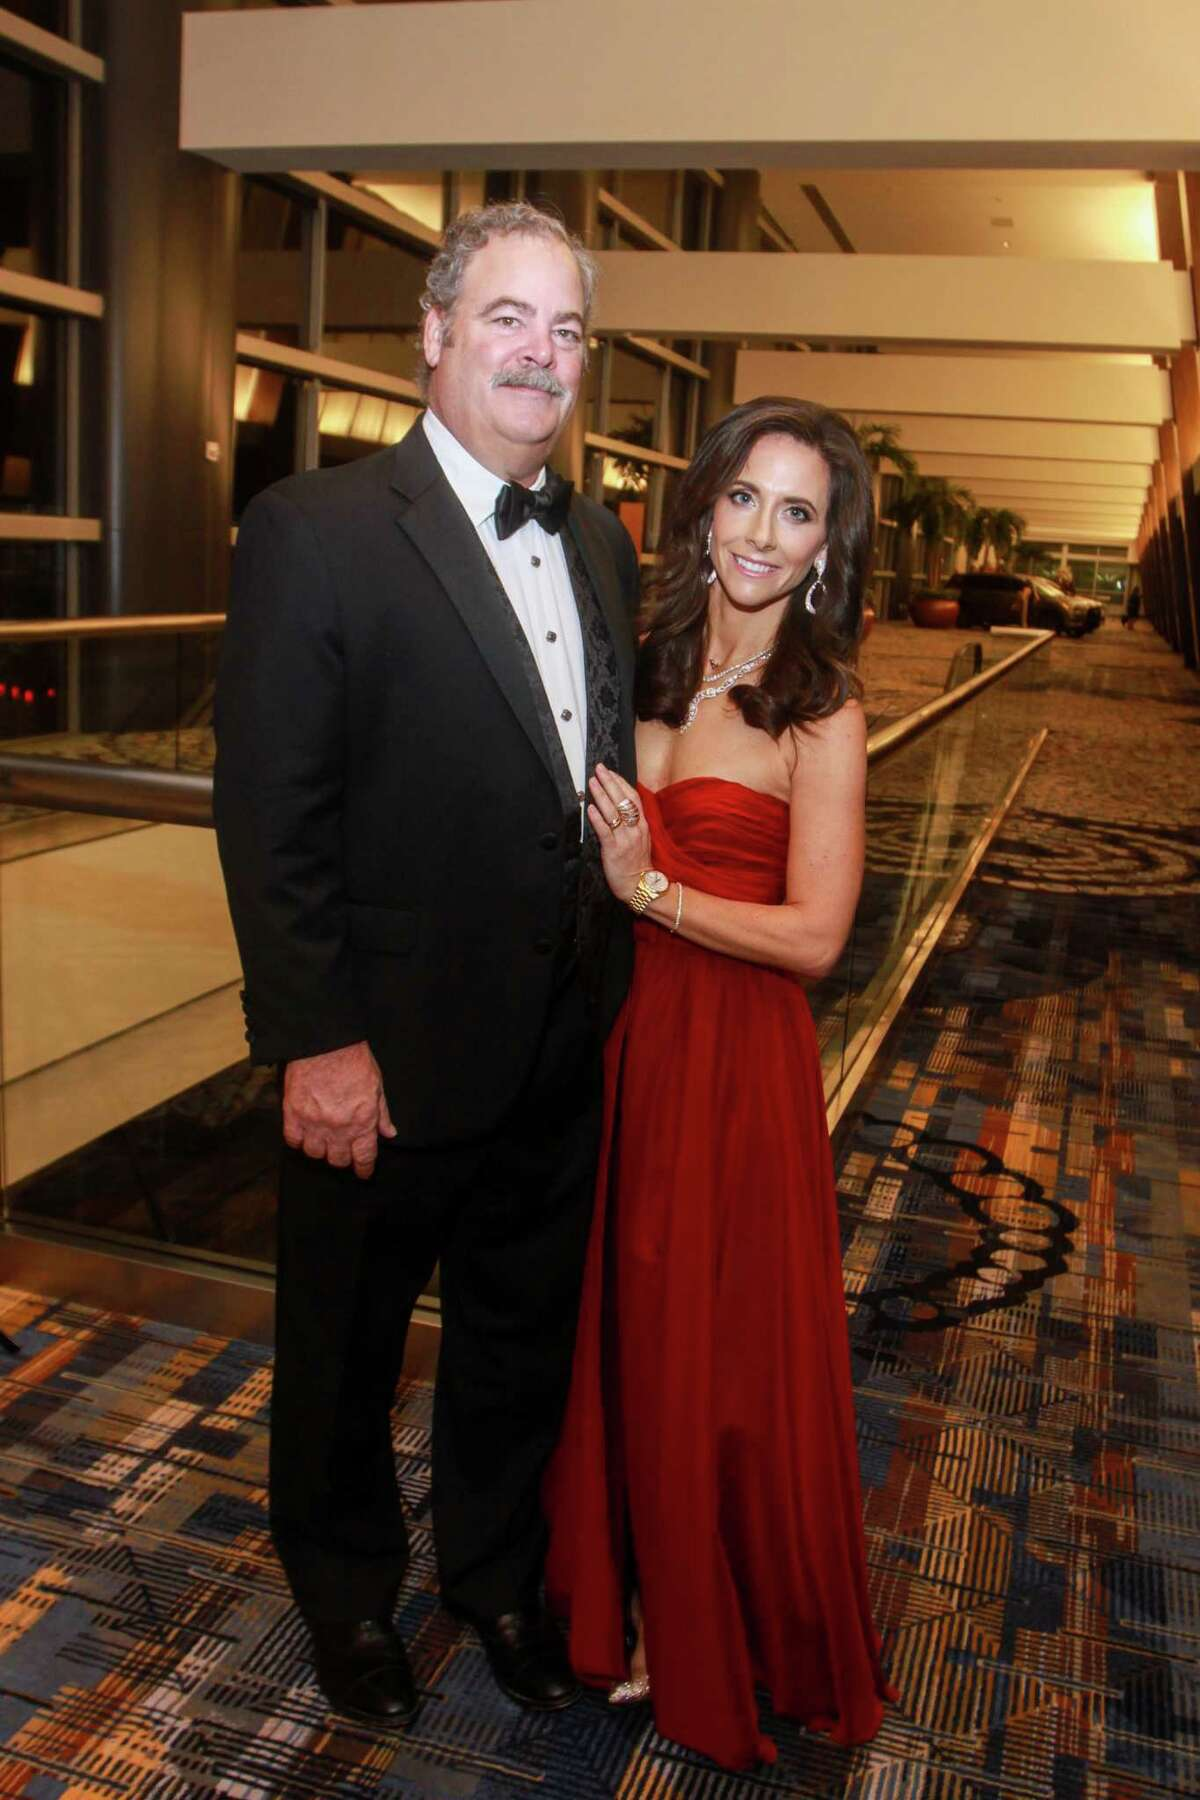 Cal McNair and honoree Hannah McNair at the Winter Ball benefiting the Crohn and Colitis Foundation on January 25, 2020 at the Hilton Americas Houston.